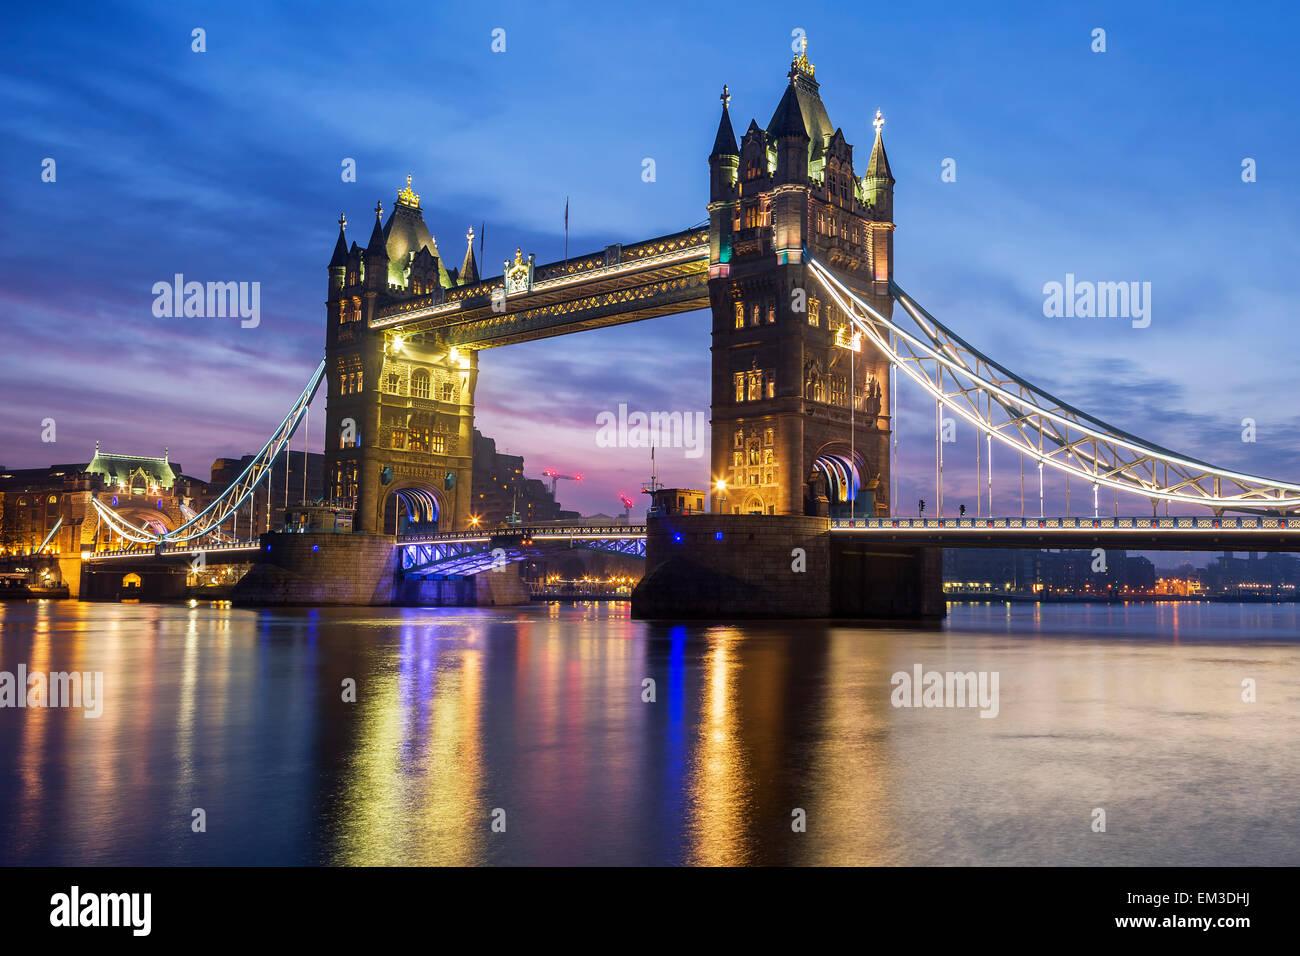 Berühmte Tower Bridge am Abend, London, England Stockbild